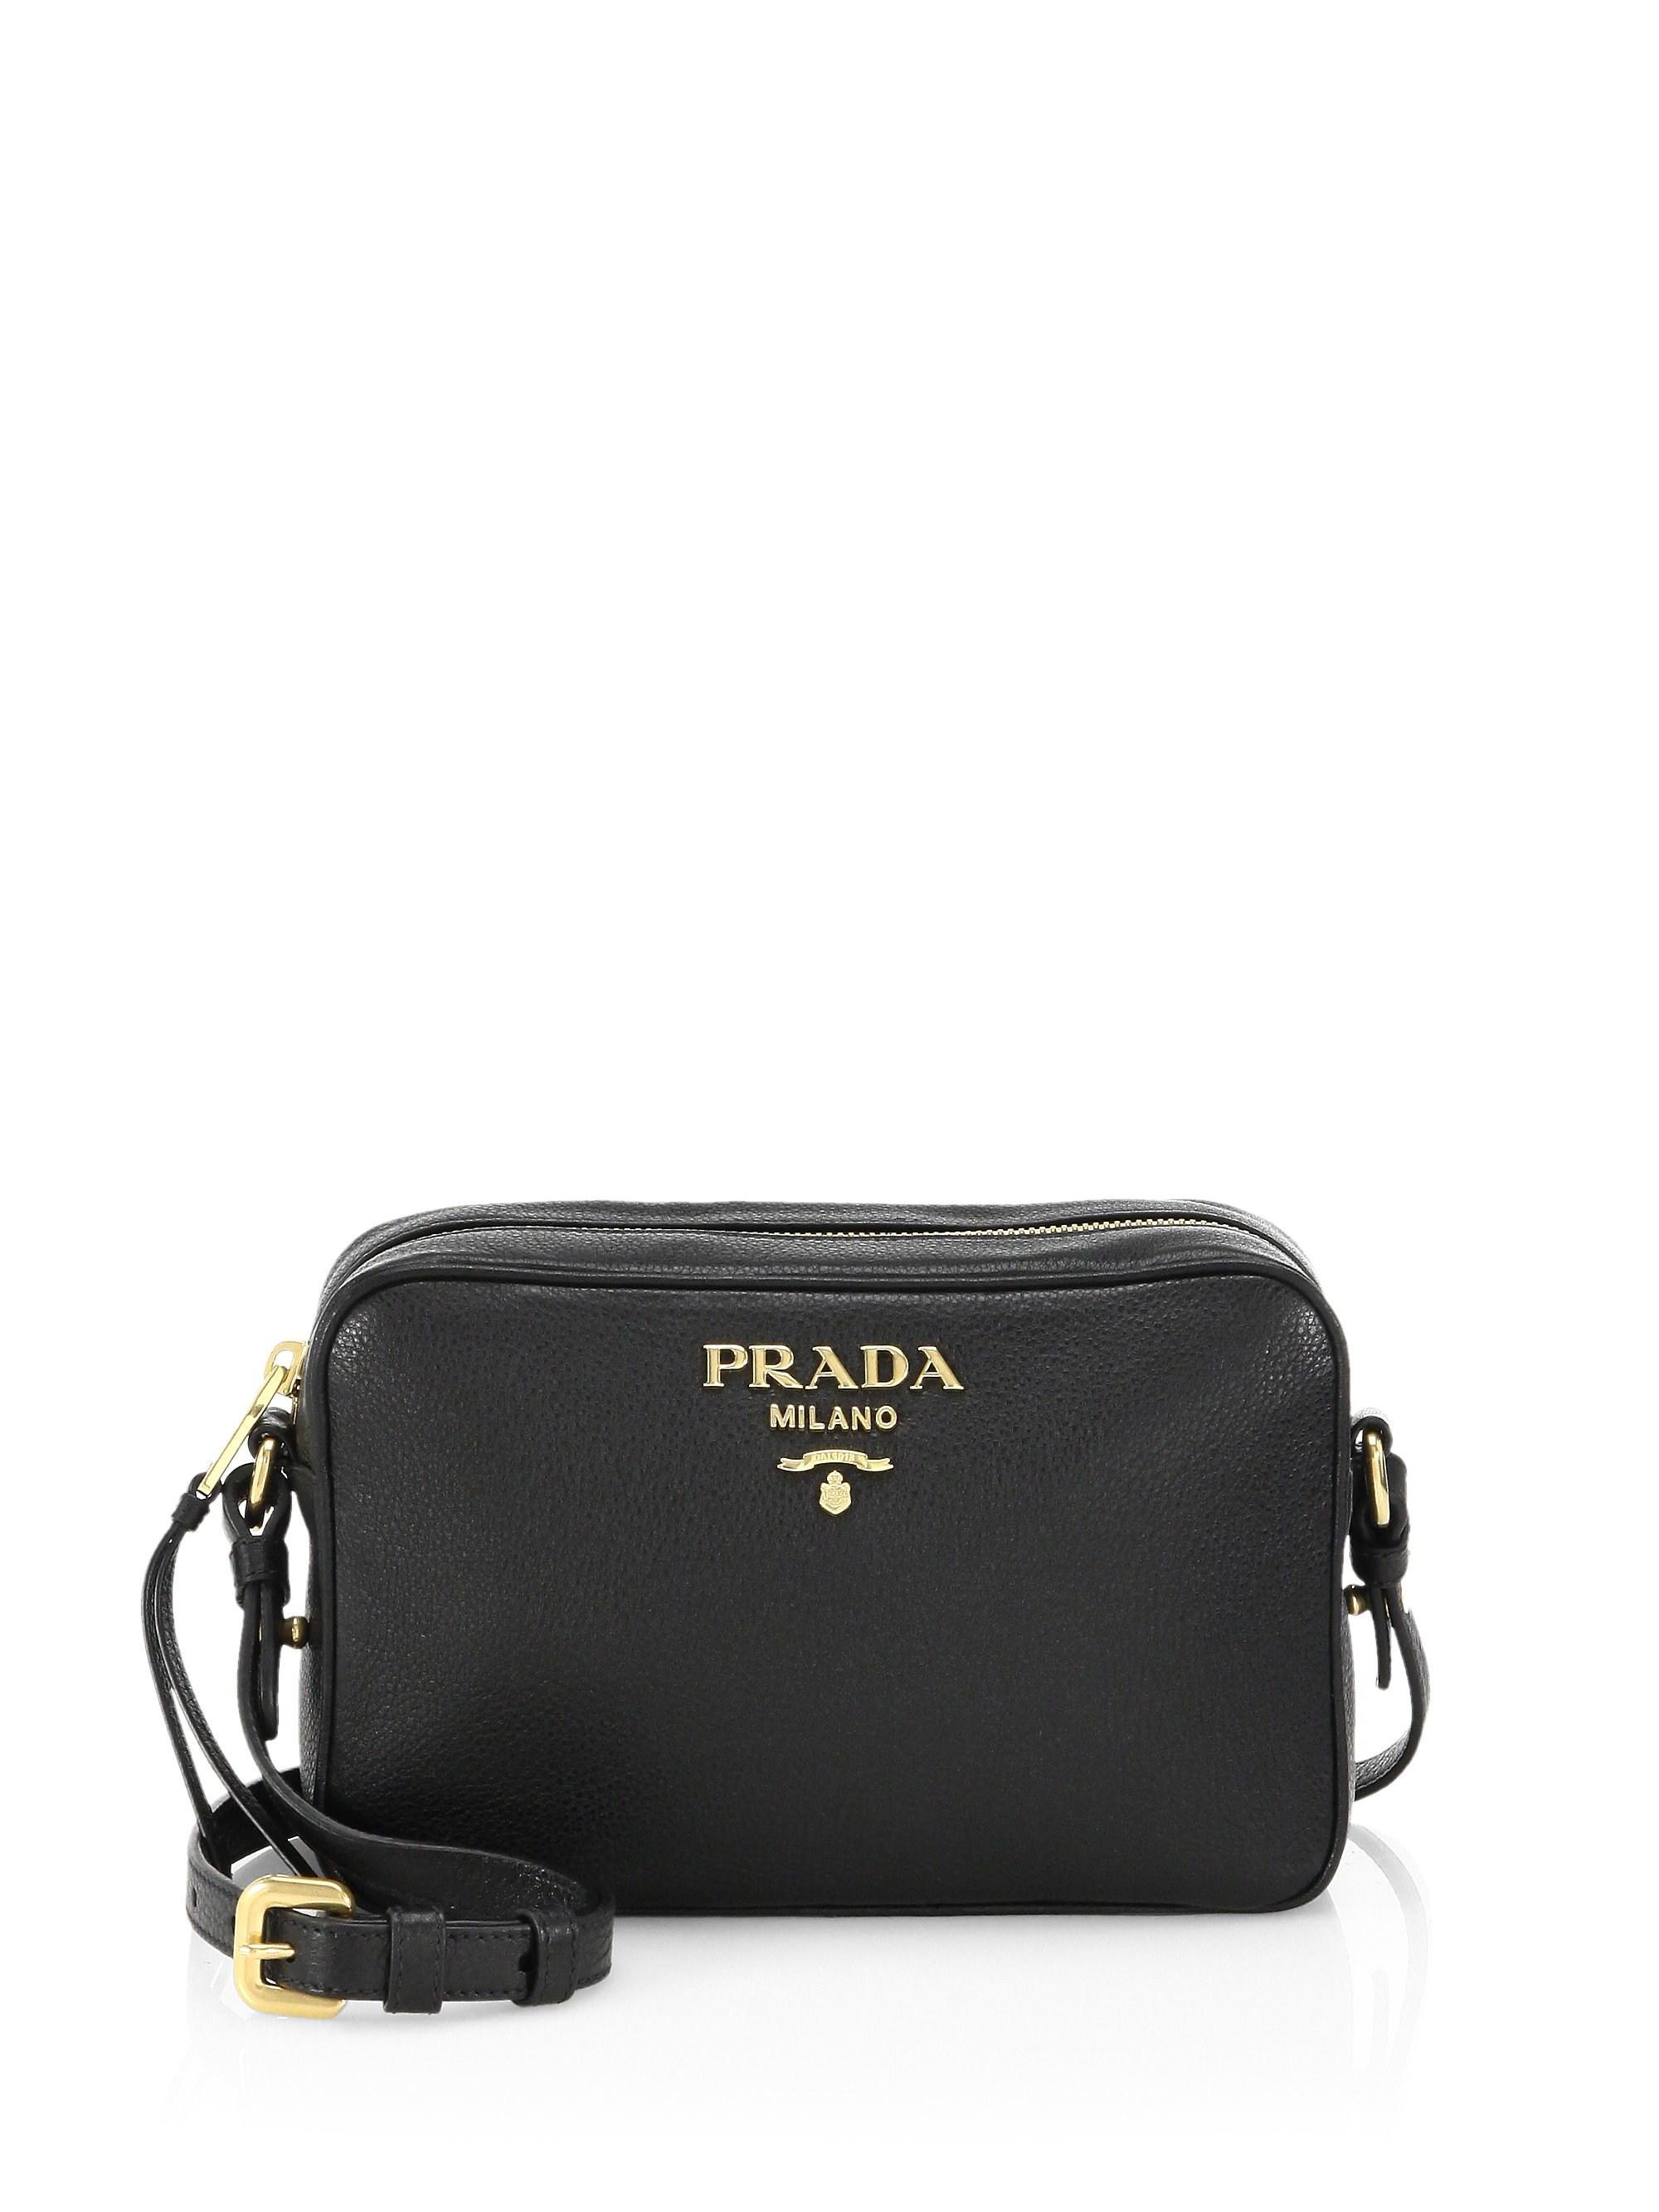 4db951cf0122 Prada - Black Women s Daino Textured Leather Mini Crossbody Bag - Cammeo -  Lyst. View fullscreen